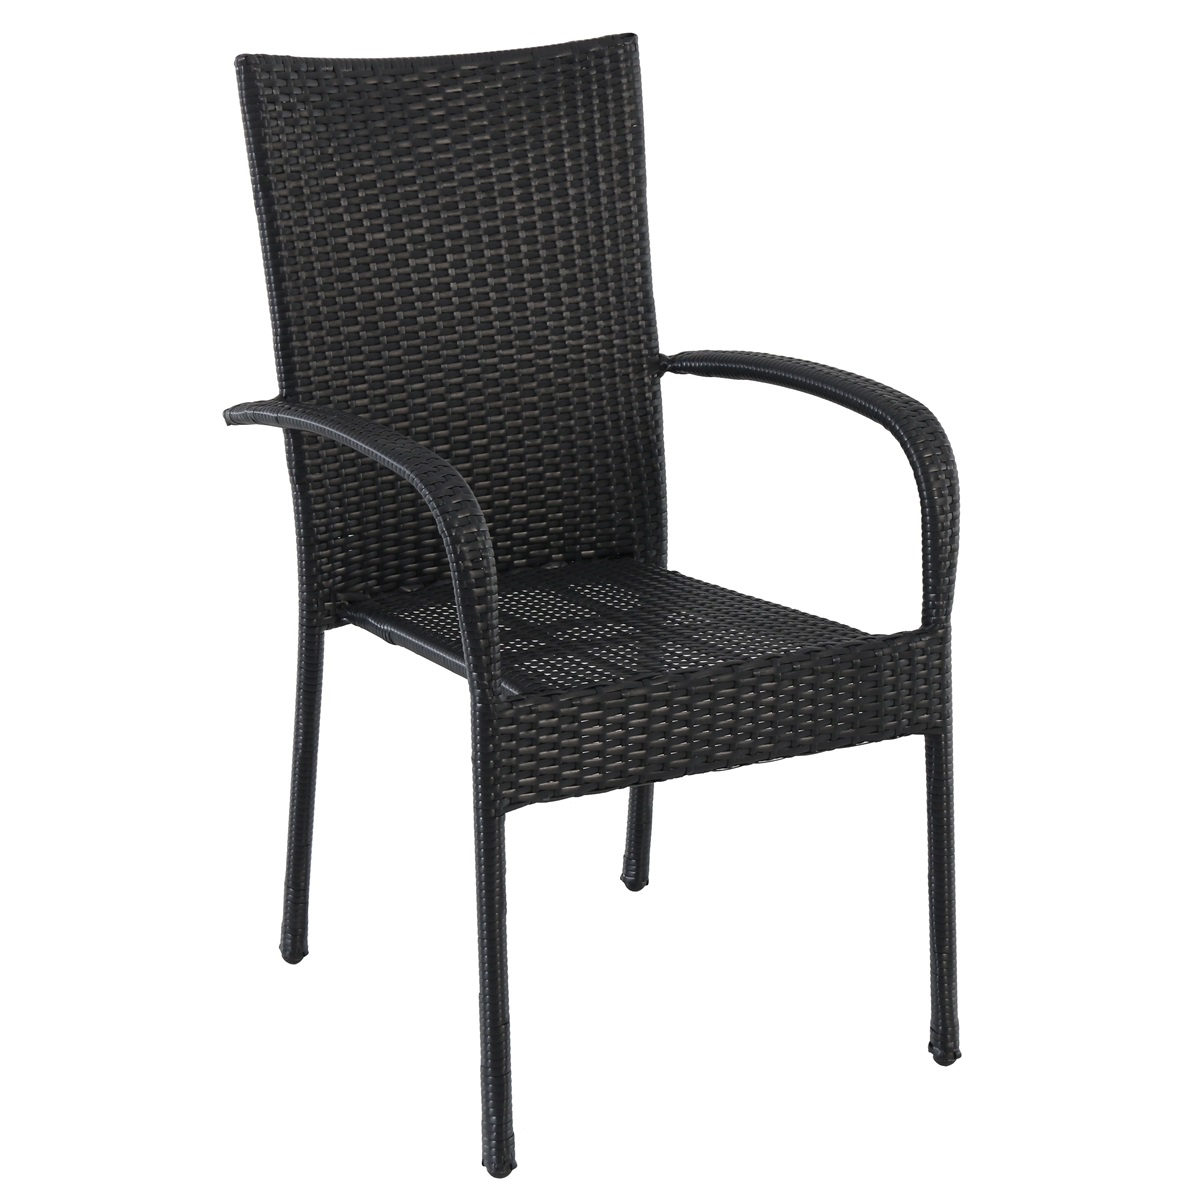 stohovatelná židle z tahokovu/ratanu Creador Amélie